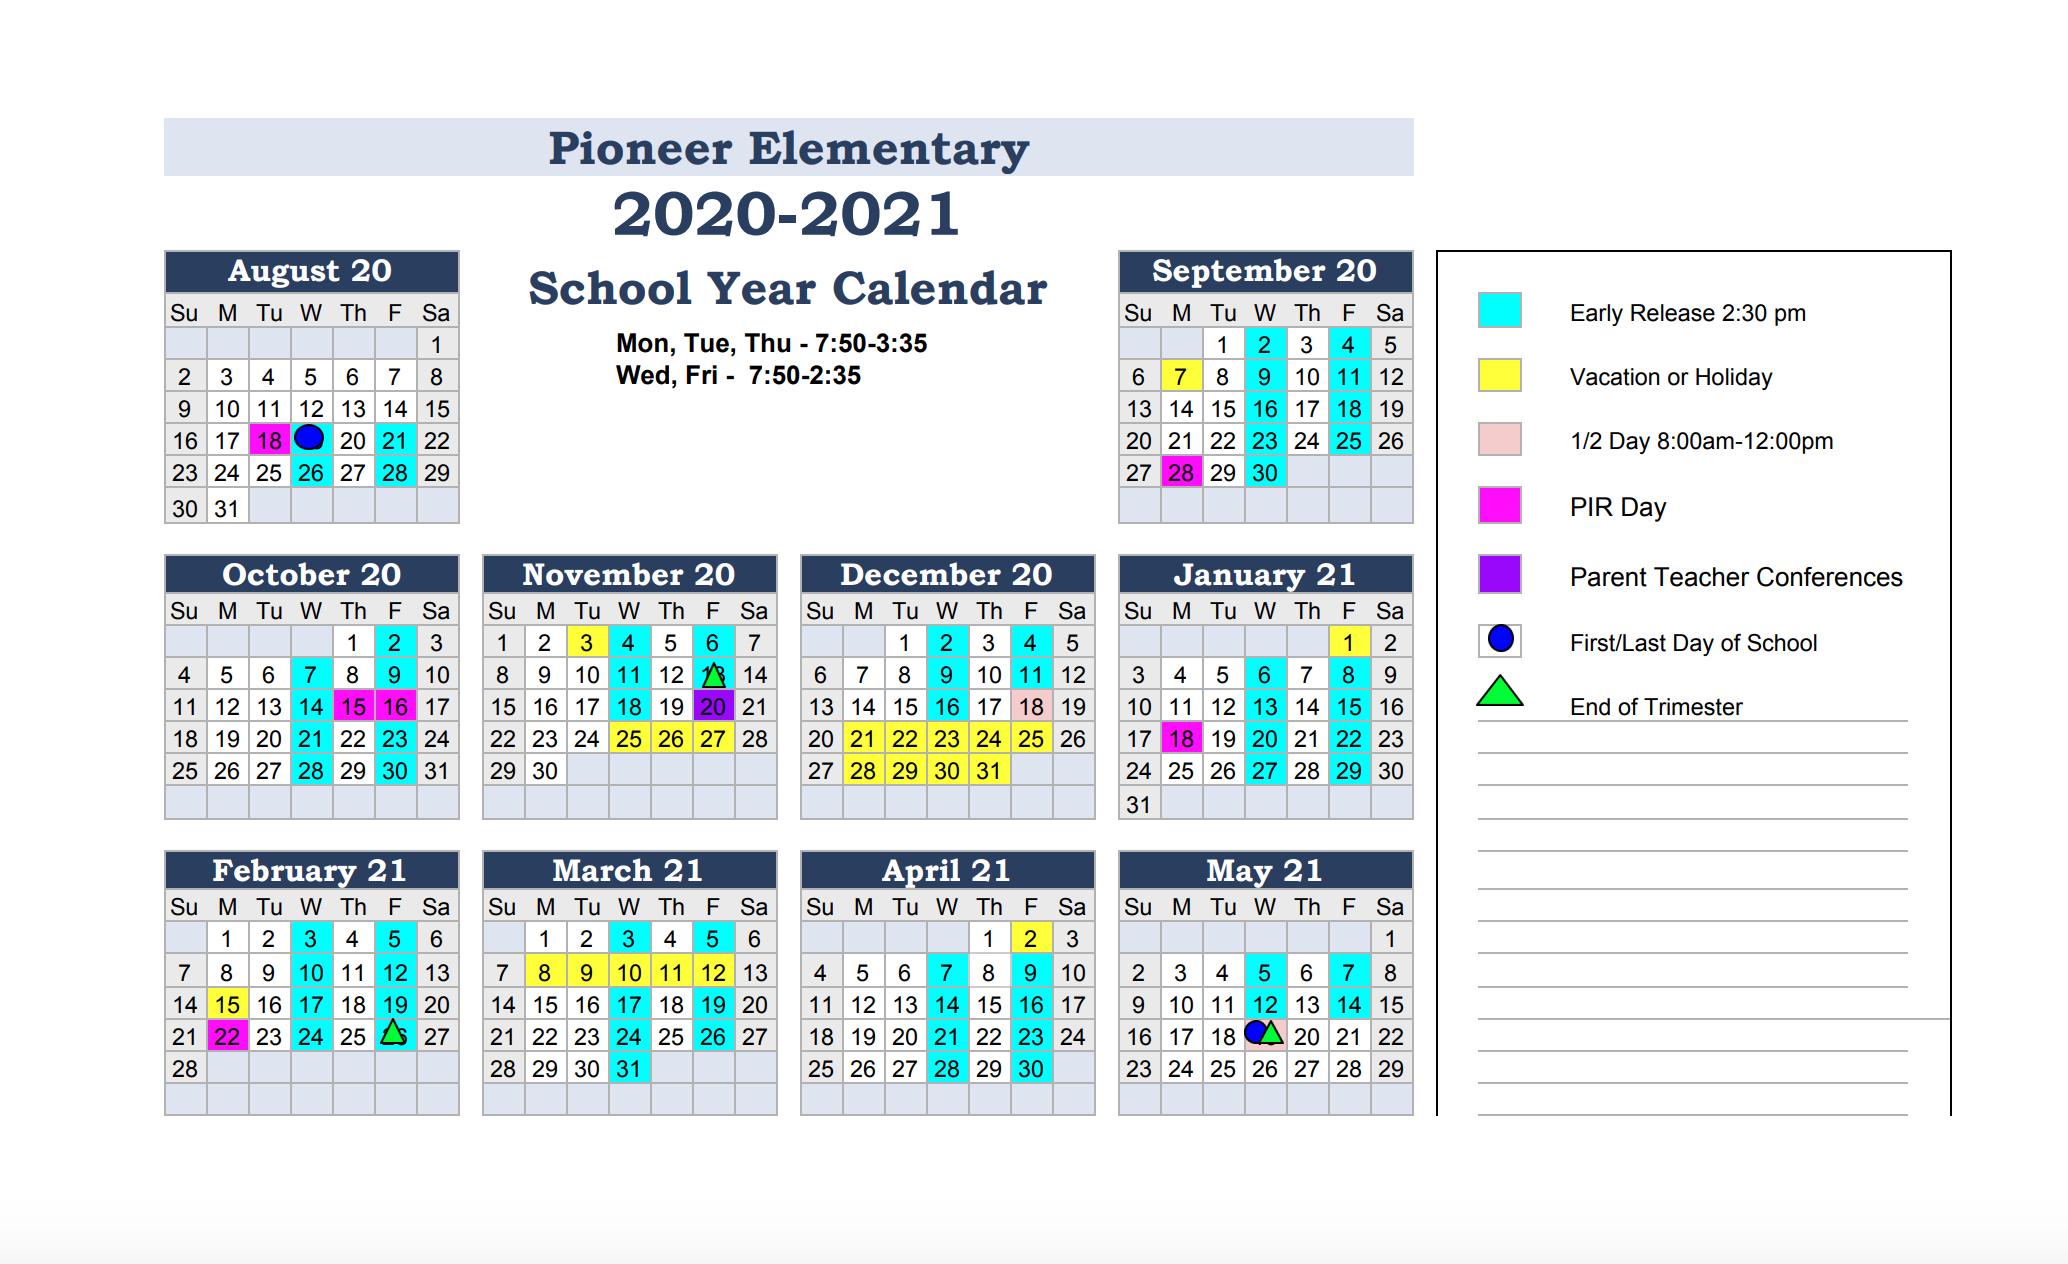 Calendar & Events - Pioneer Elementary School Throughout Billings School District 2 Calander